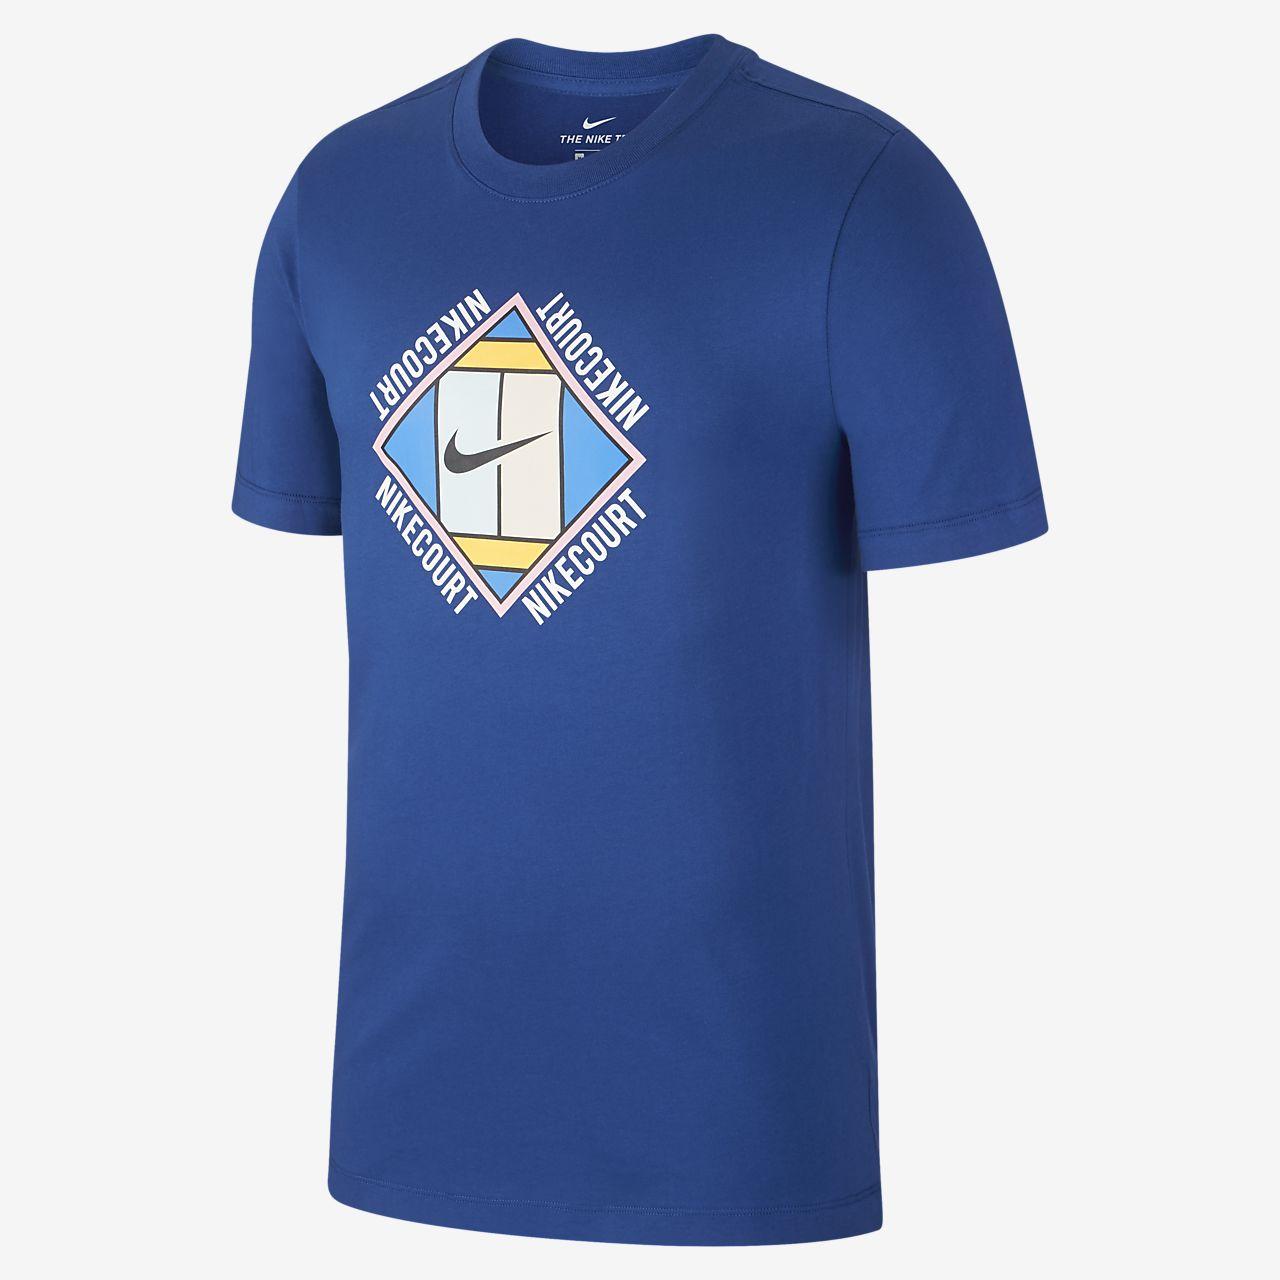 NikeCourt Men's Graphic Tennis T-Shirt